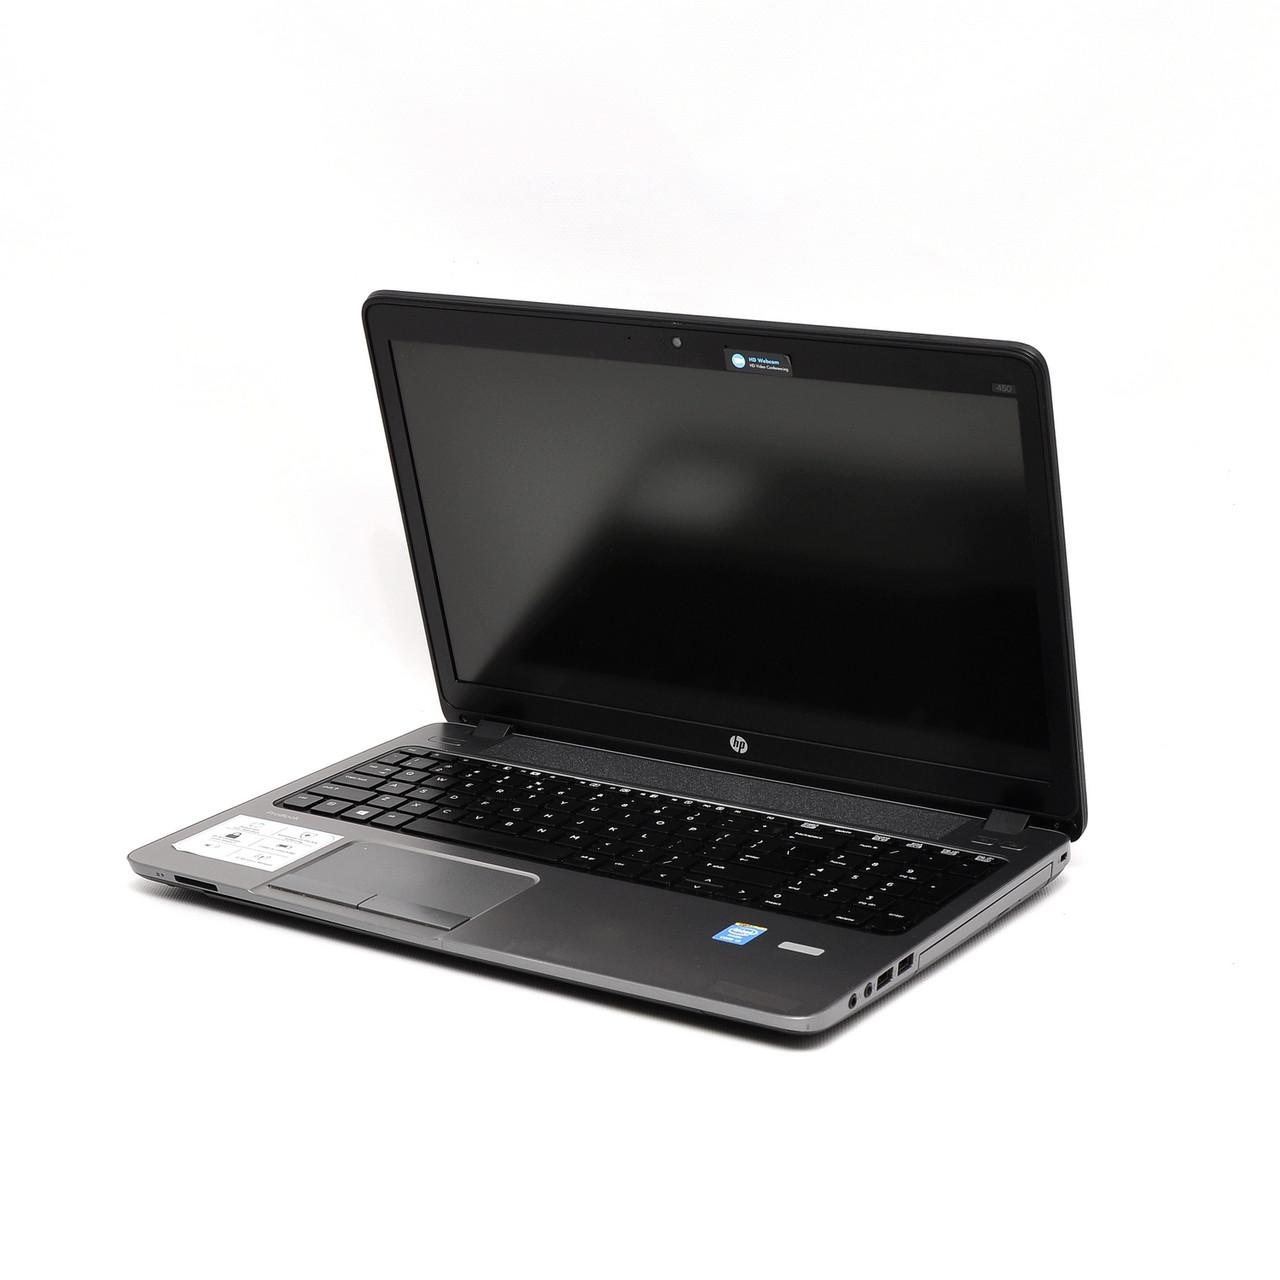 "Б/У Ноутбук    HP ProBook 450 G1 / 15.6"" / Intel Core i3-4000M / 16 RAM / 500 HDD /  Intel HD 4600"